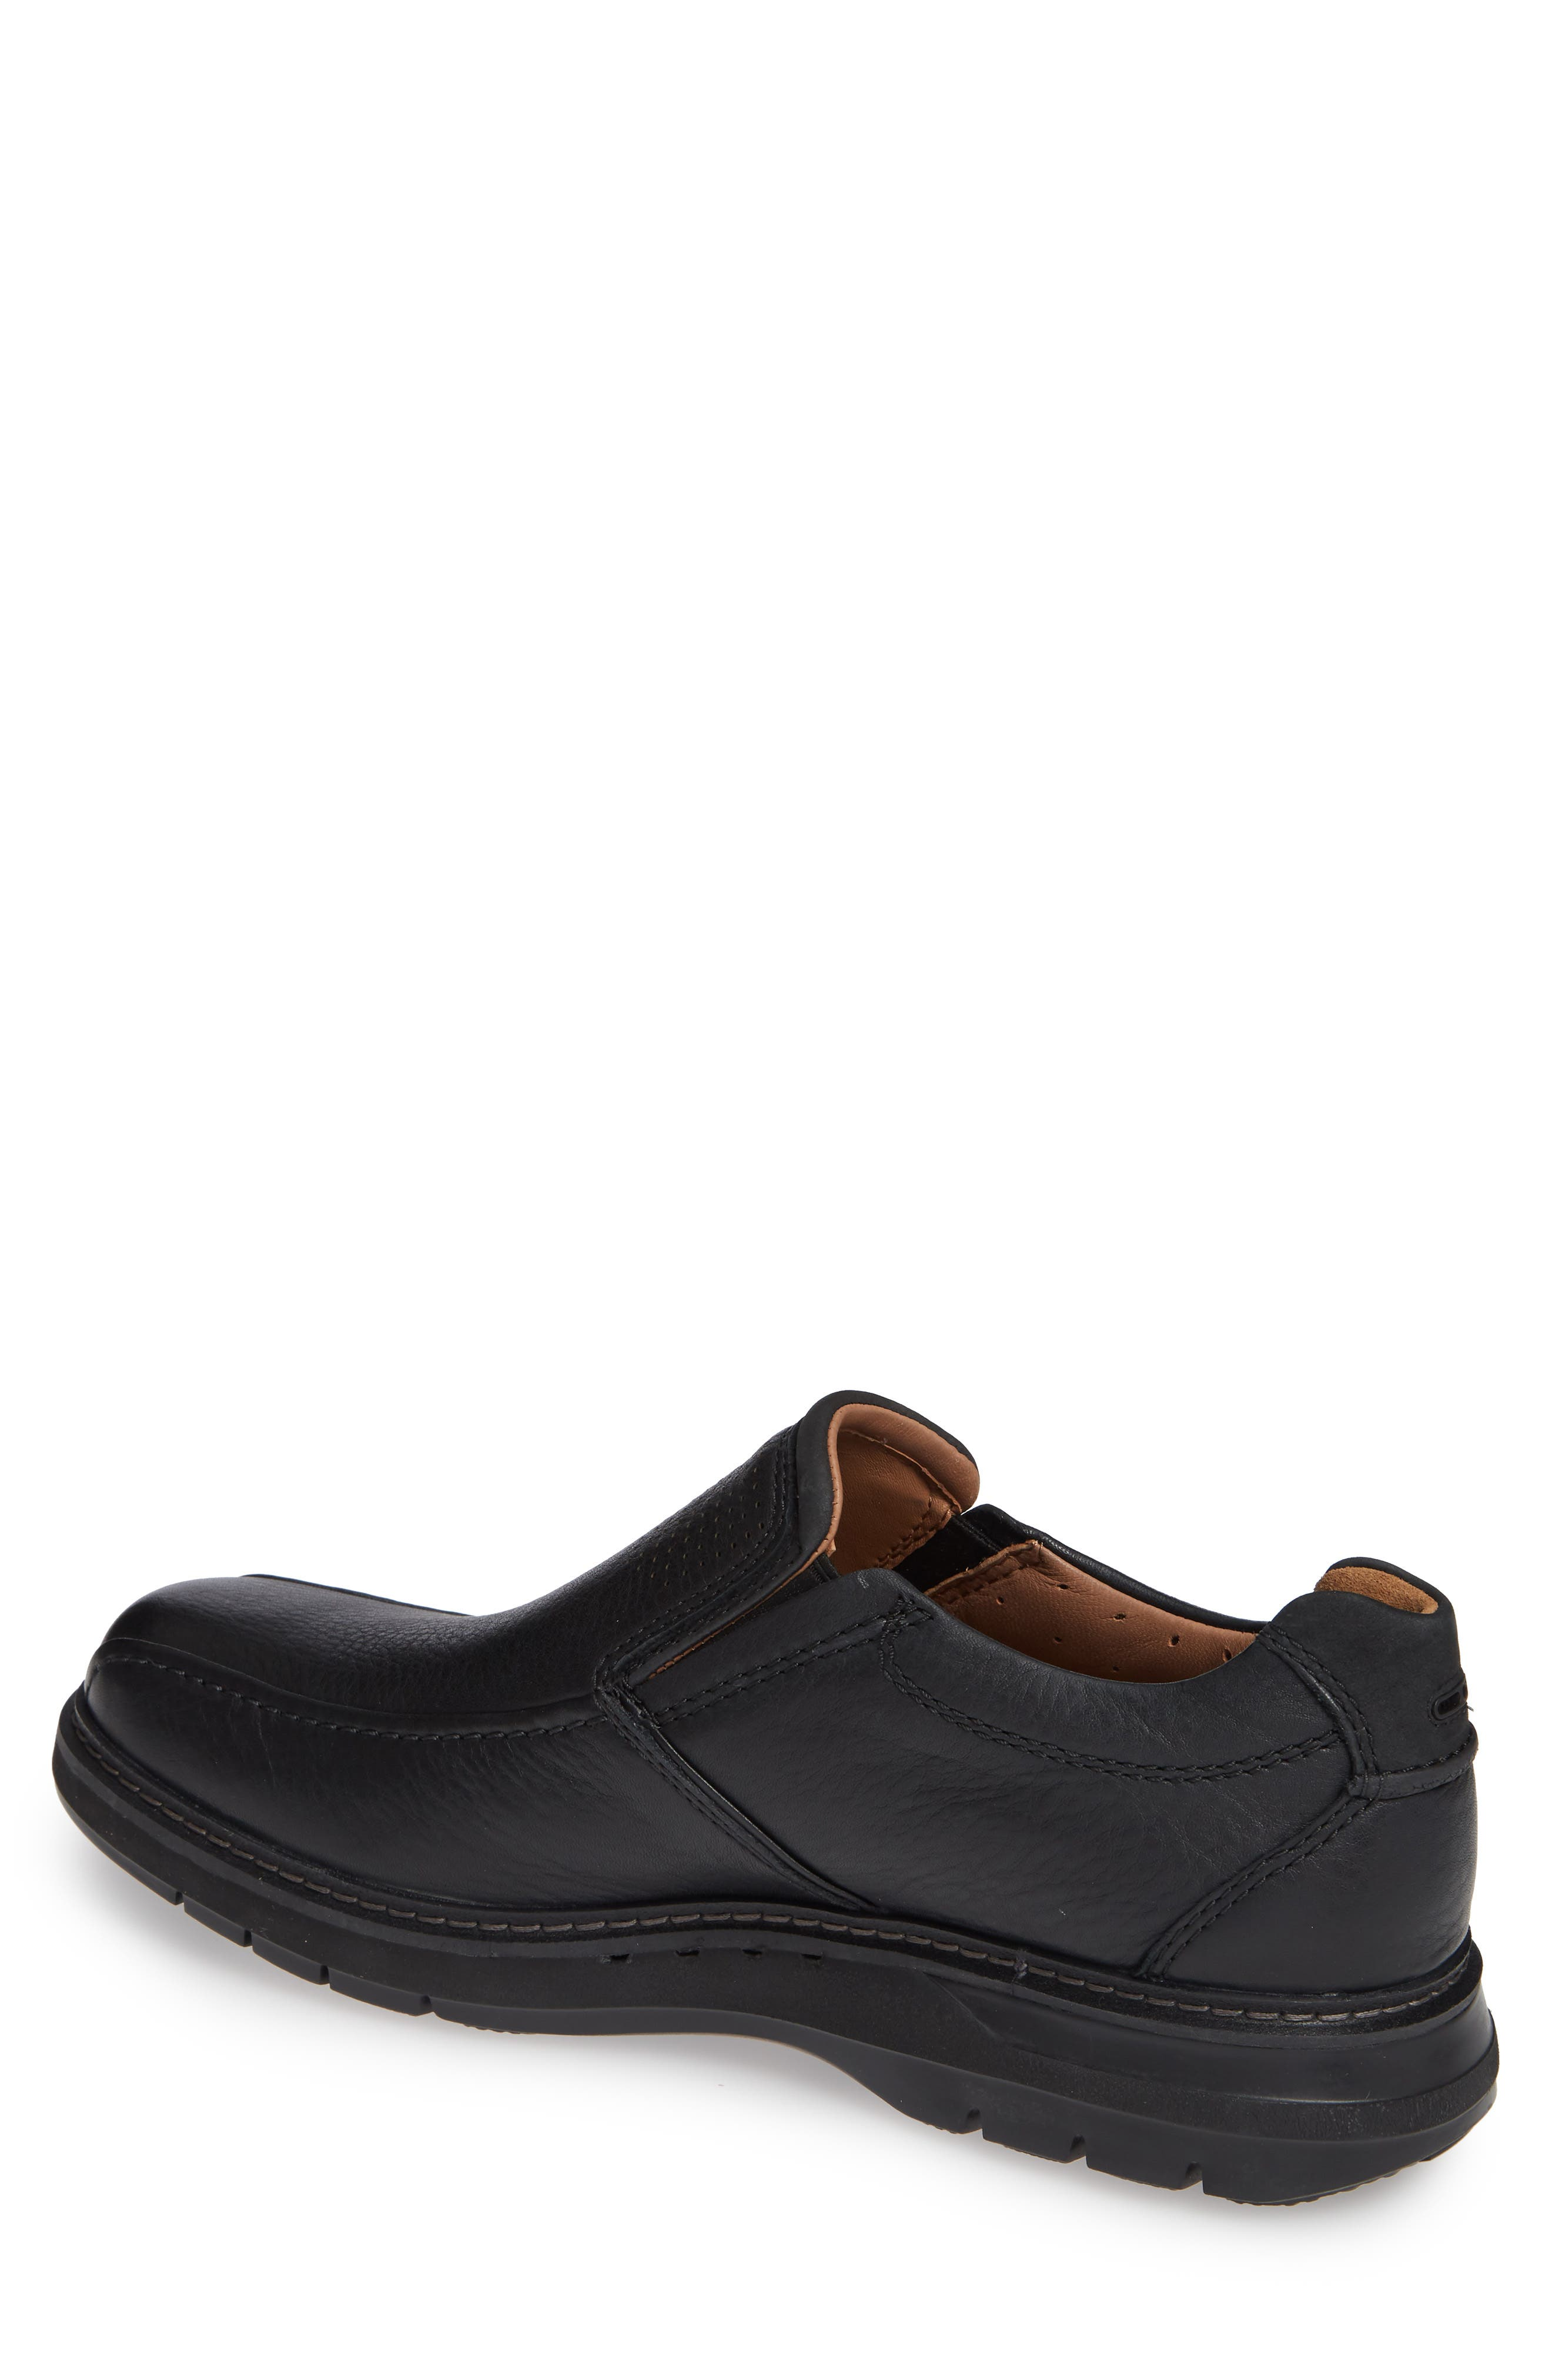 Un Ramble Step Venetian Loafer,                             Alternate thumbnail 2, color,                             BLACK LEATHER